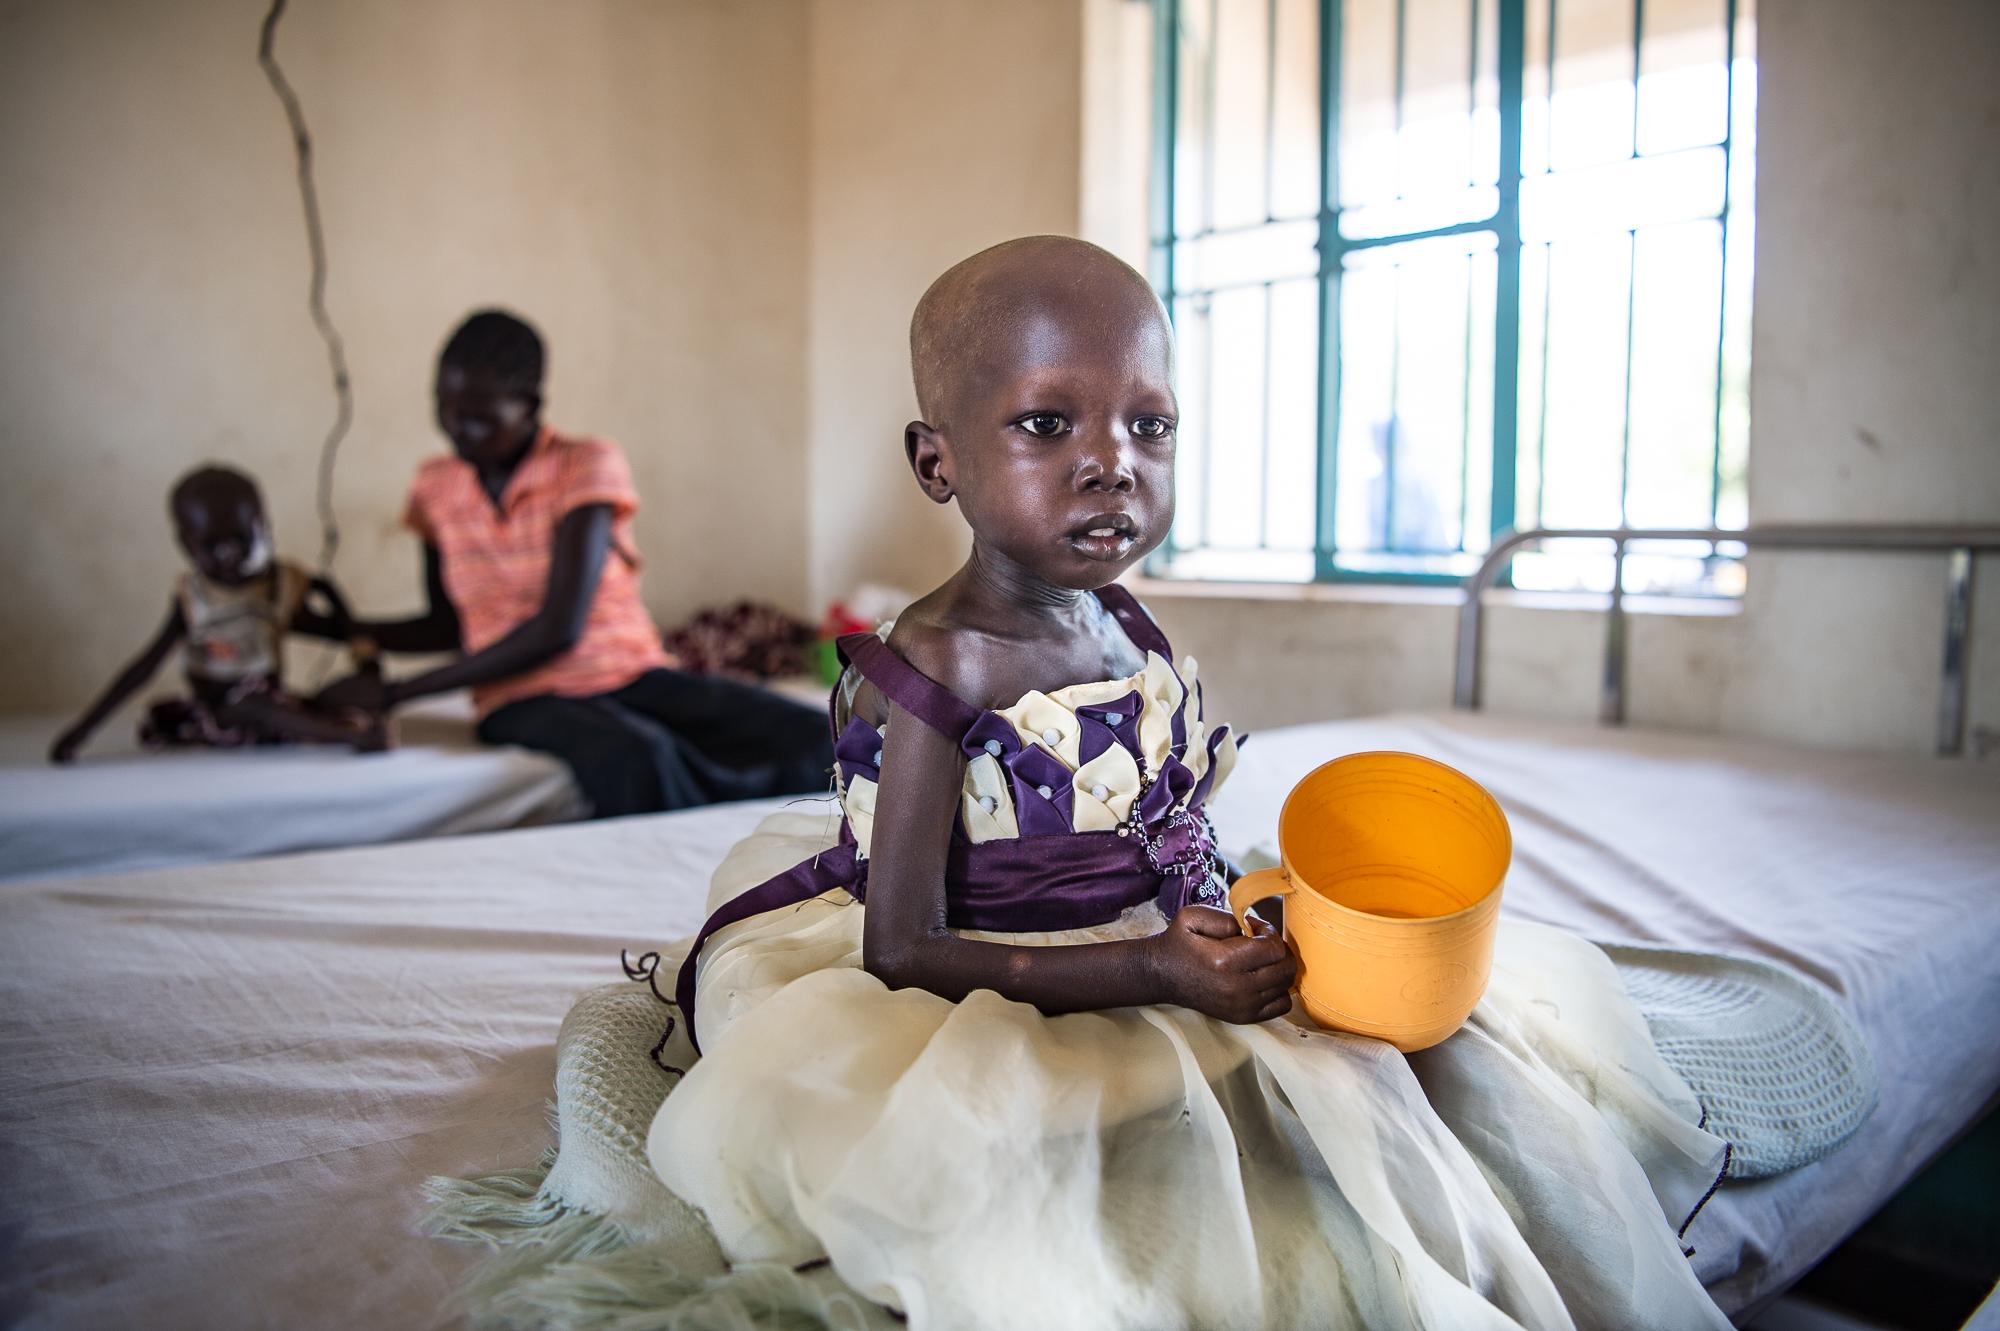 AE_SS16_UNICEF__8864-2.jpg